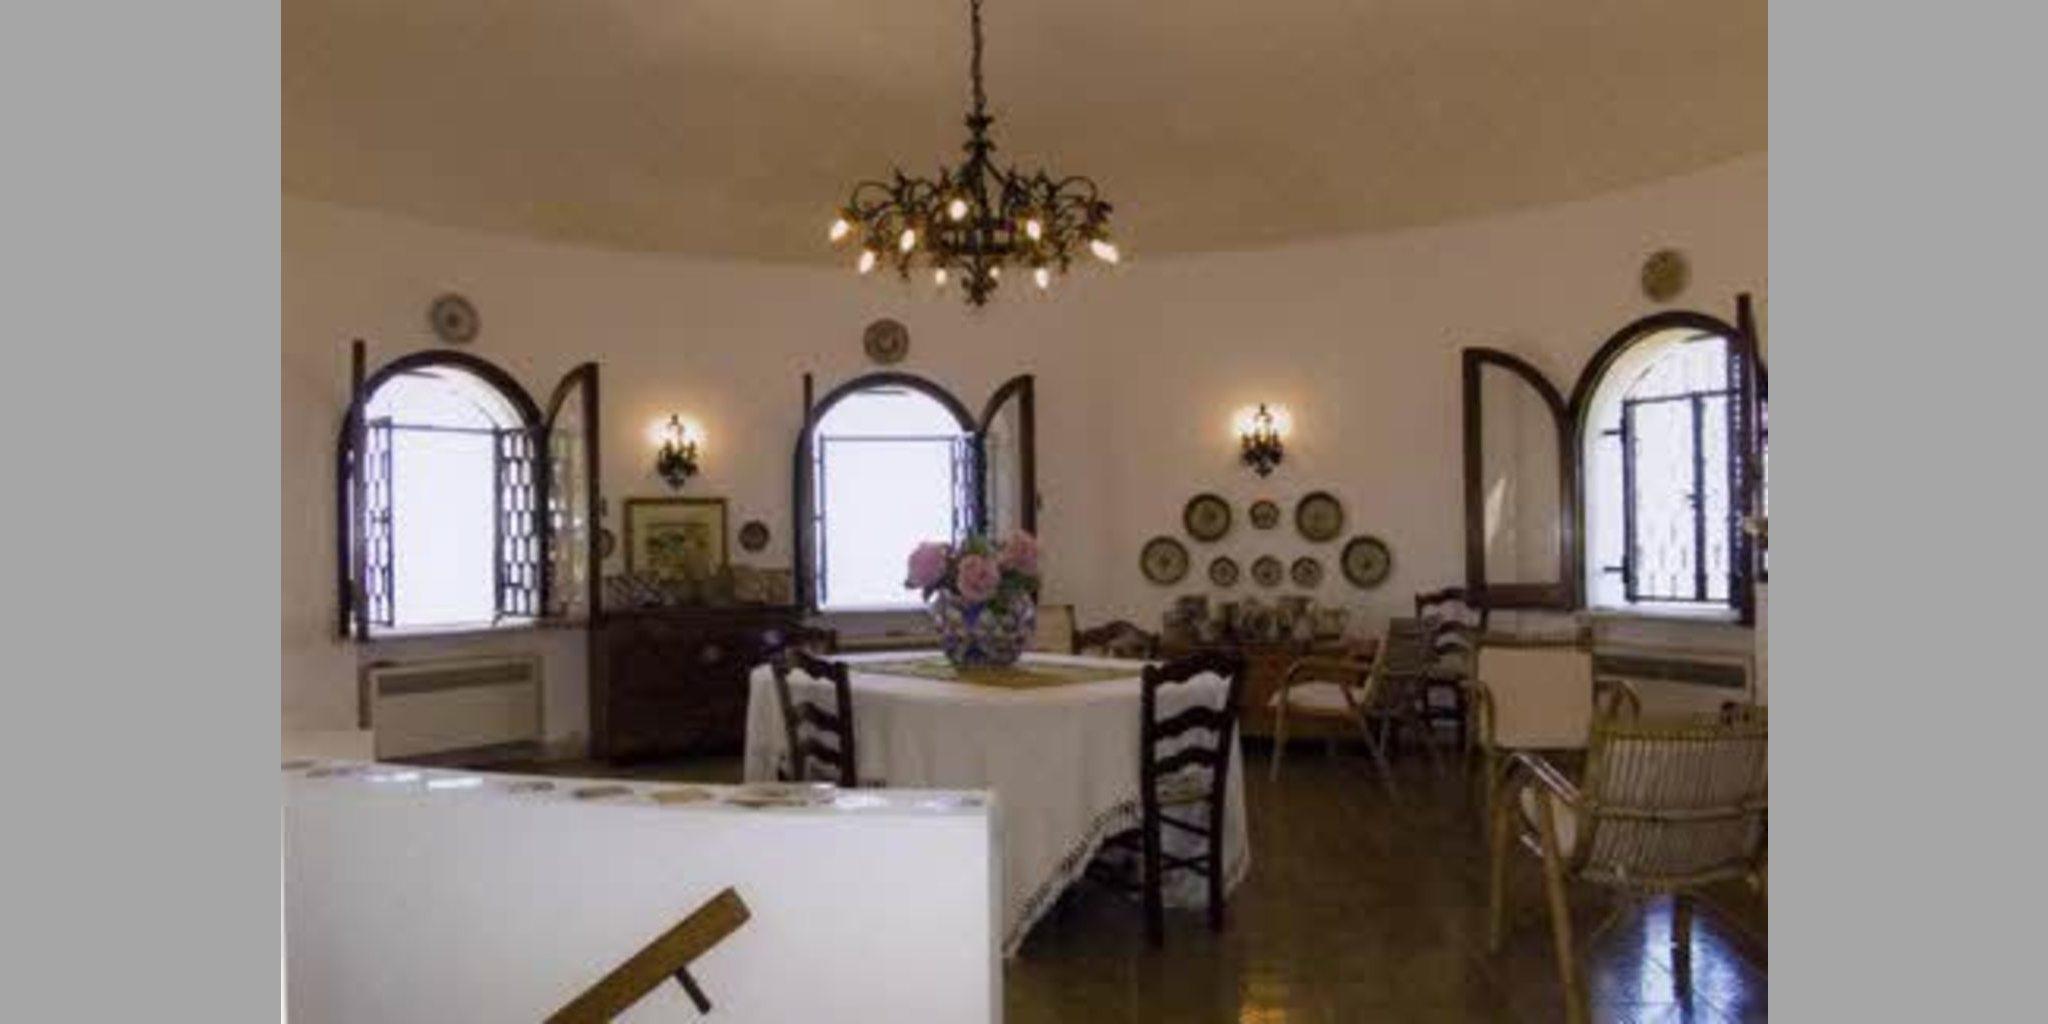 Bed & Breakfast Marsala - Lungomare Spagnola